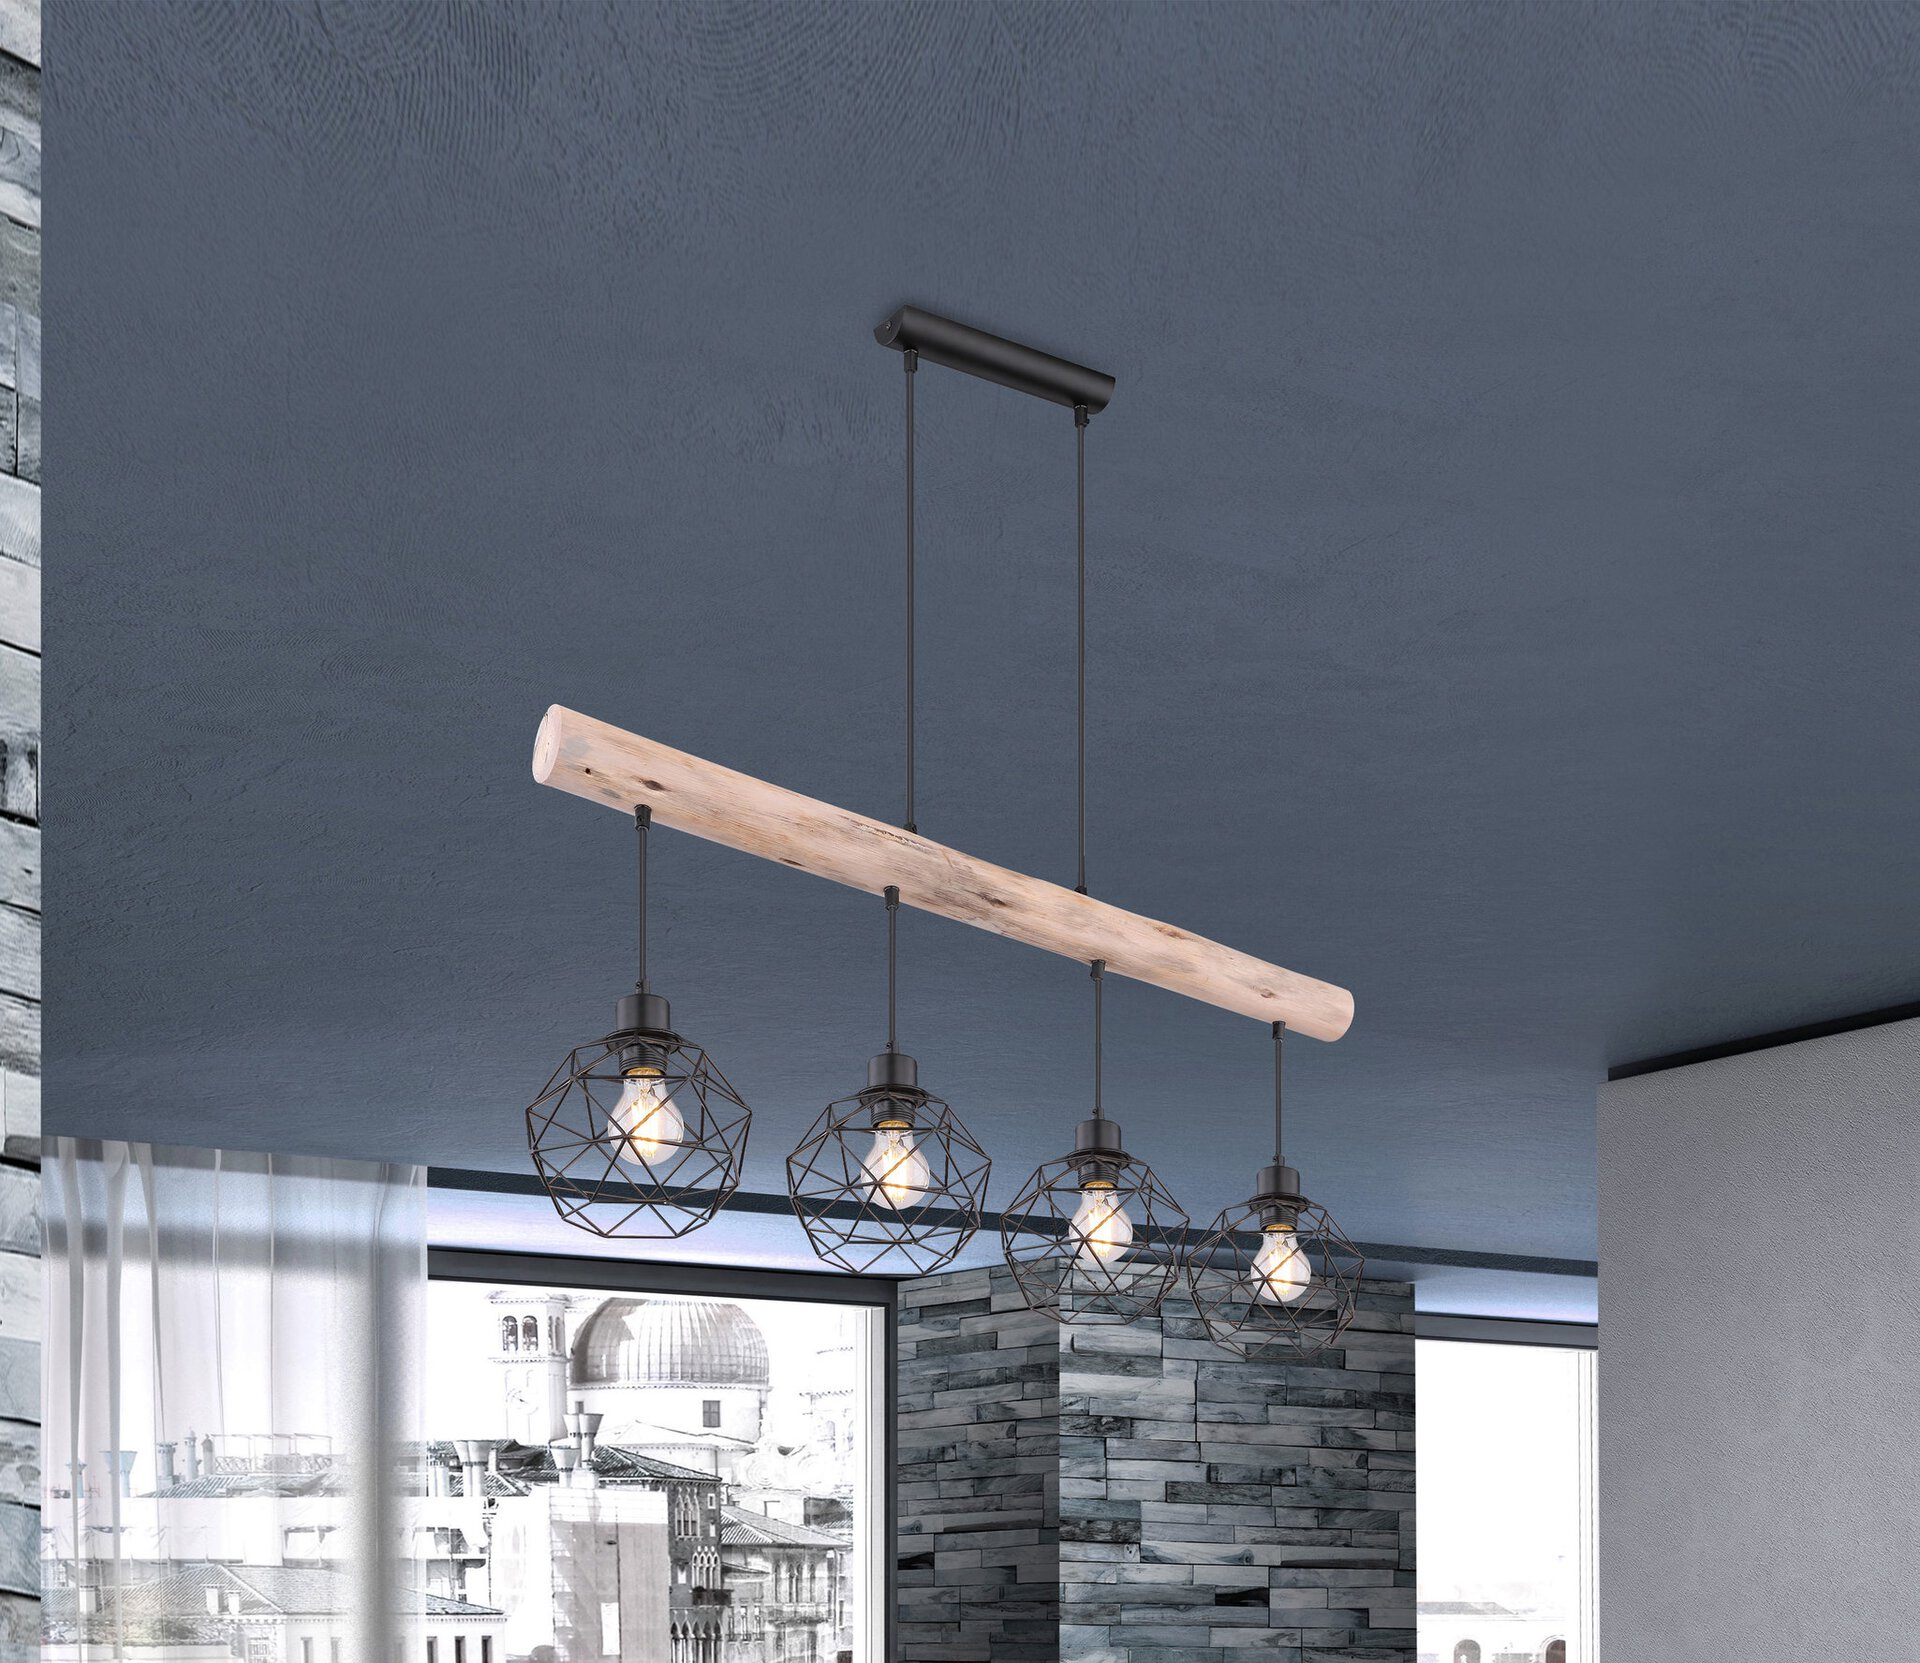 Hängeleuchte THEODOR Globo Holz 18 x 120 x 85 cm